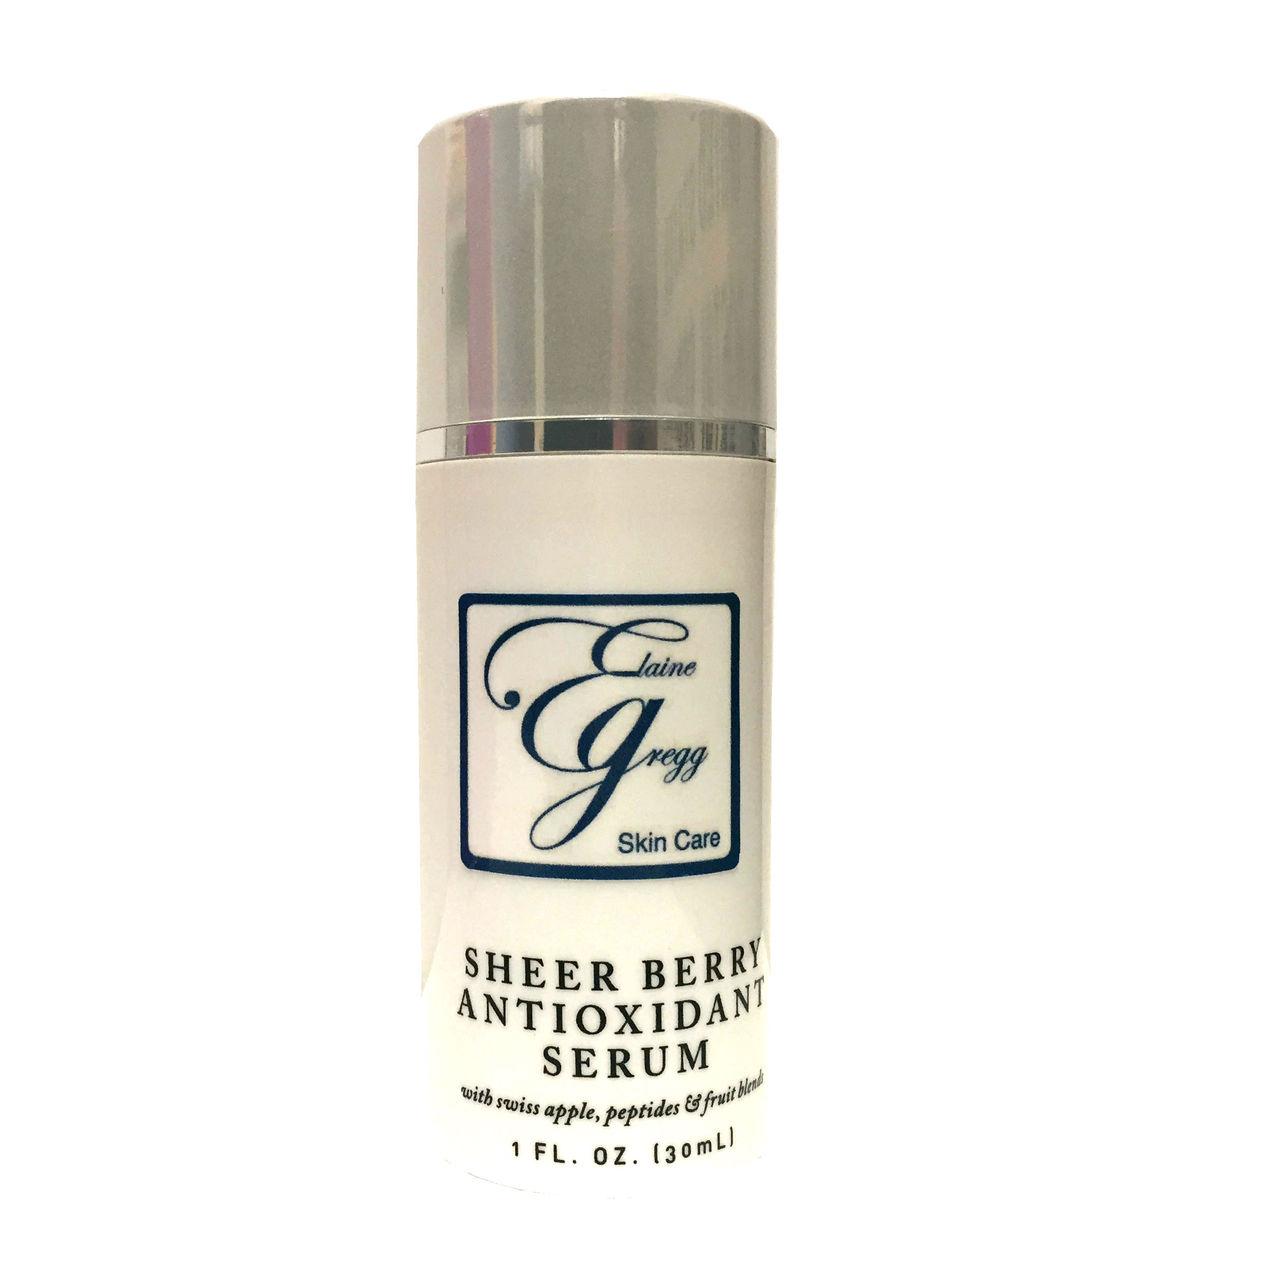 Elaine Gregg Sheer Berry Antioxidant Serum